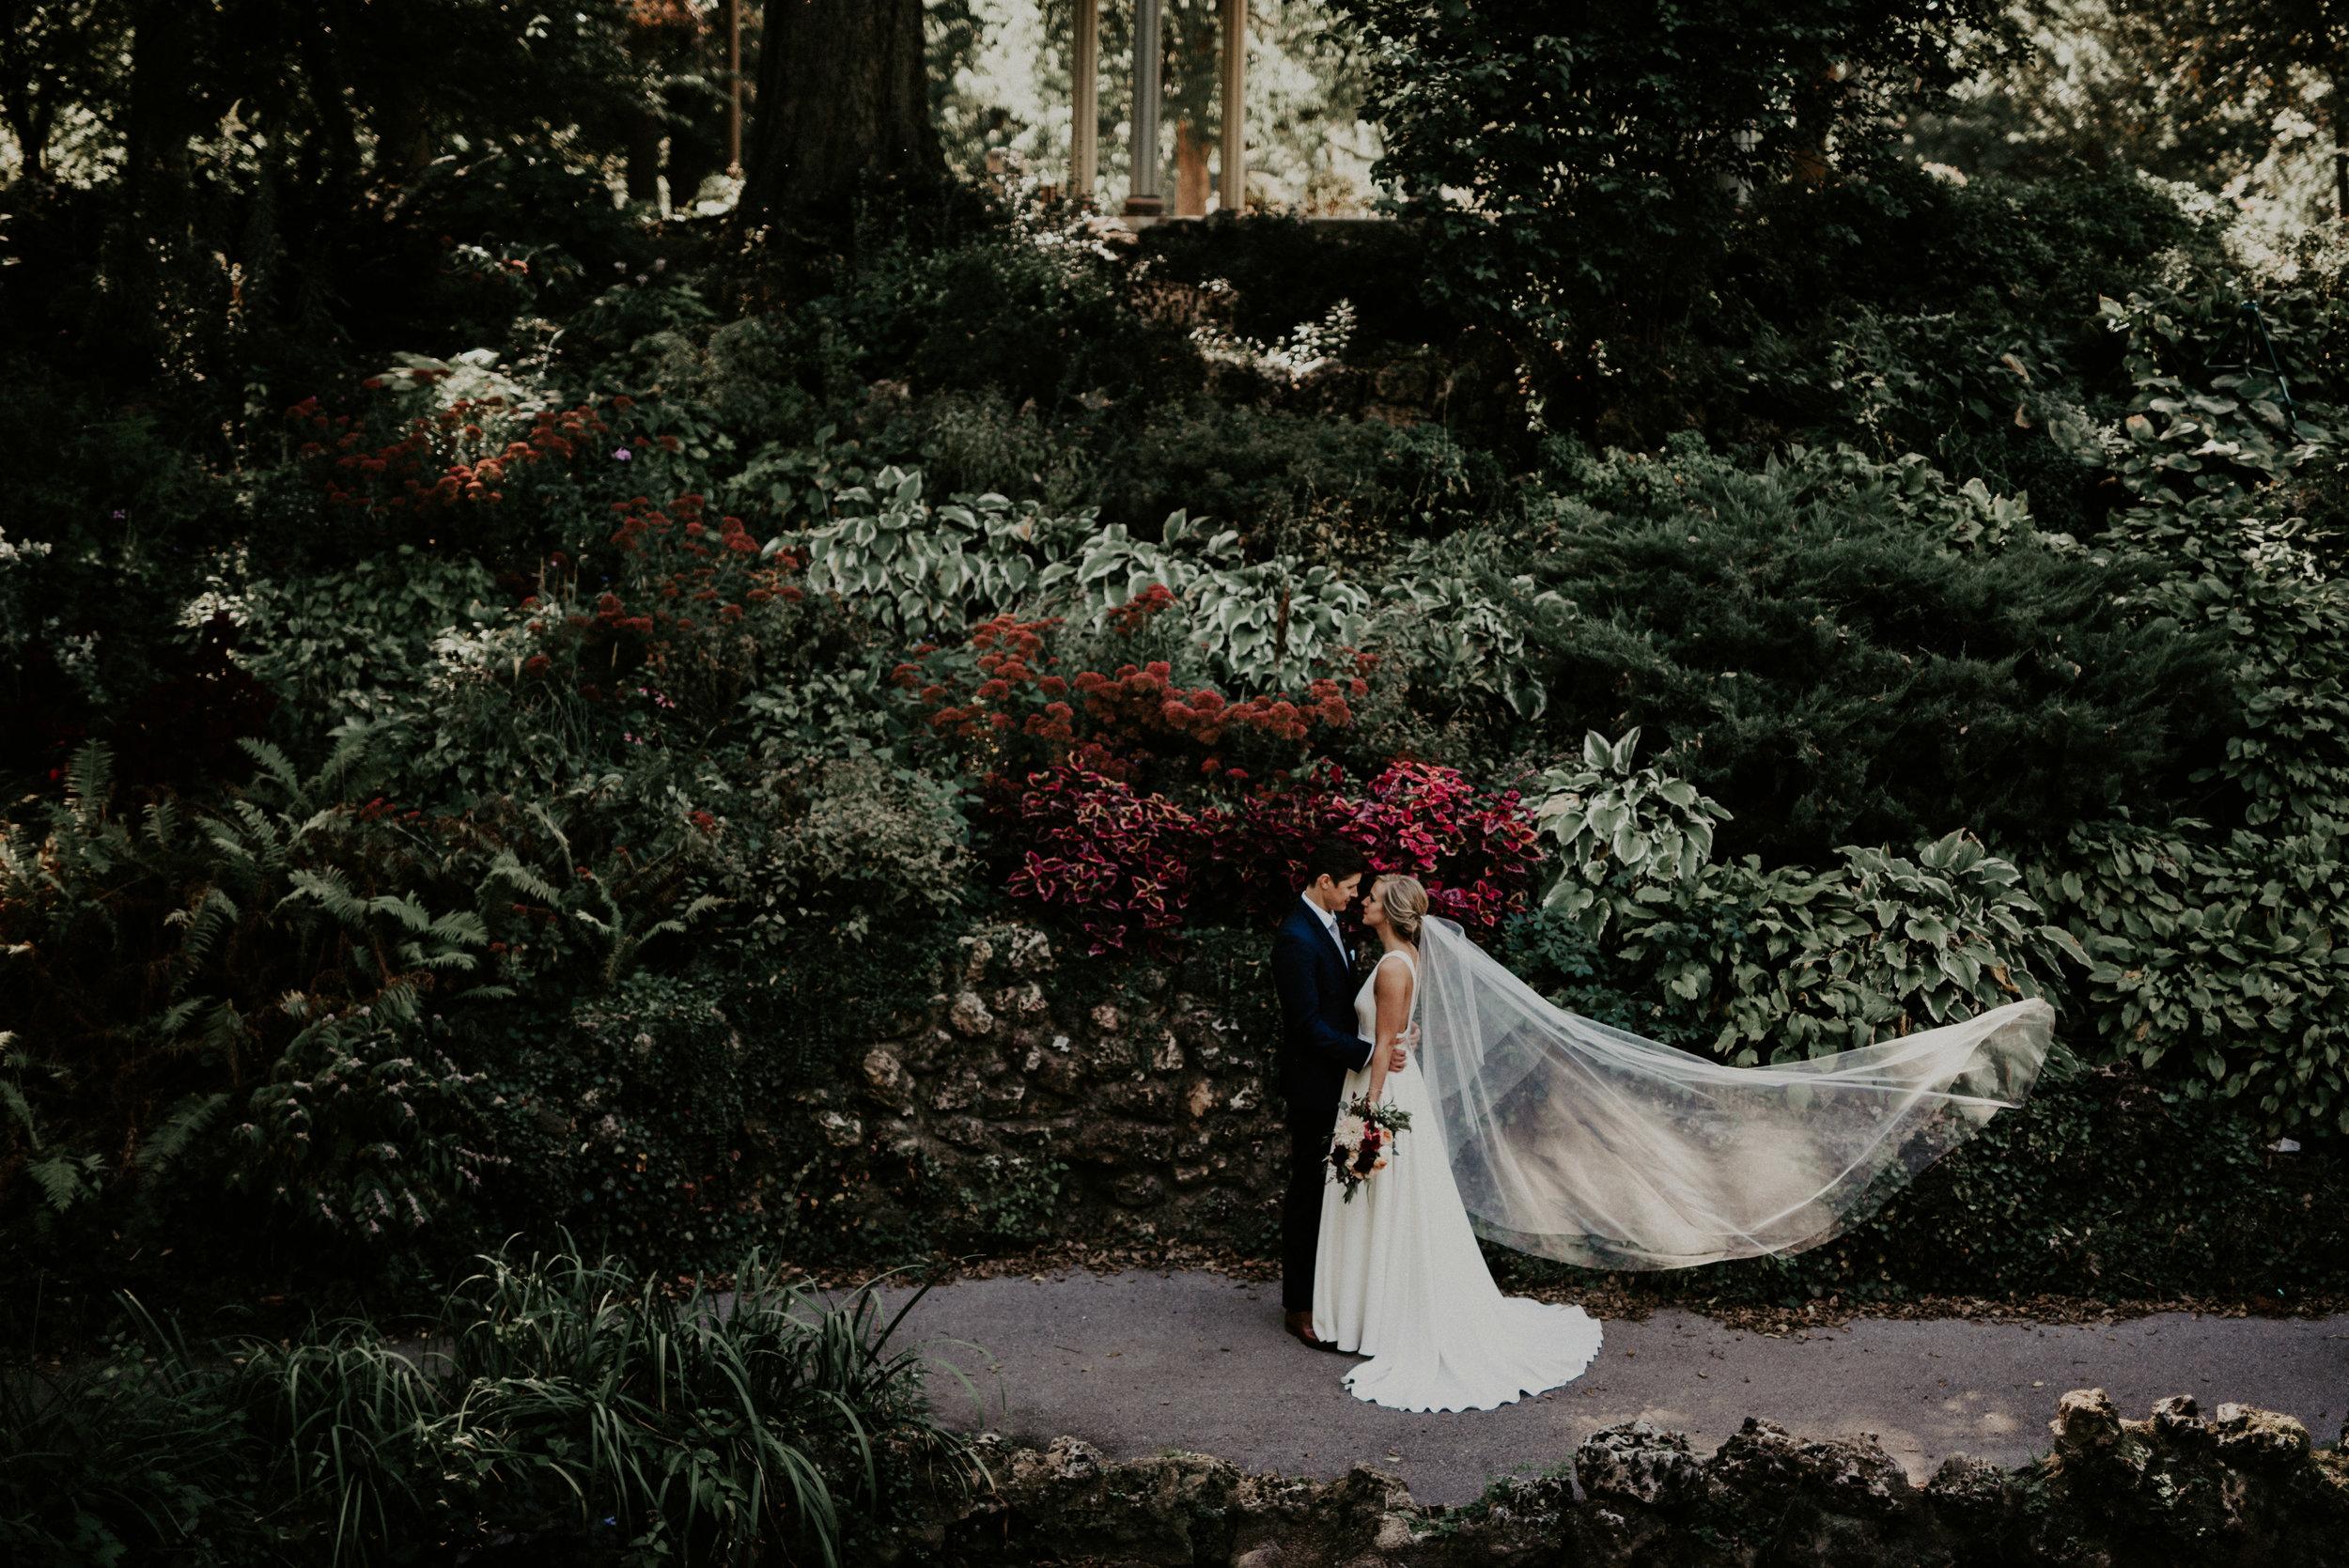 Annie_Sam_Married-330.jpg